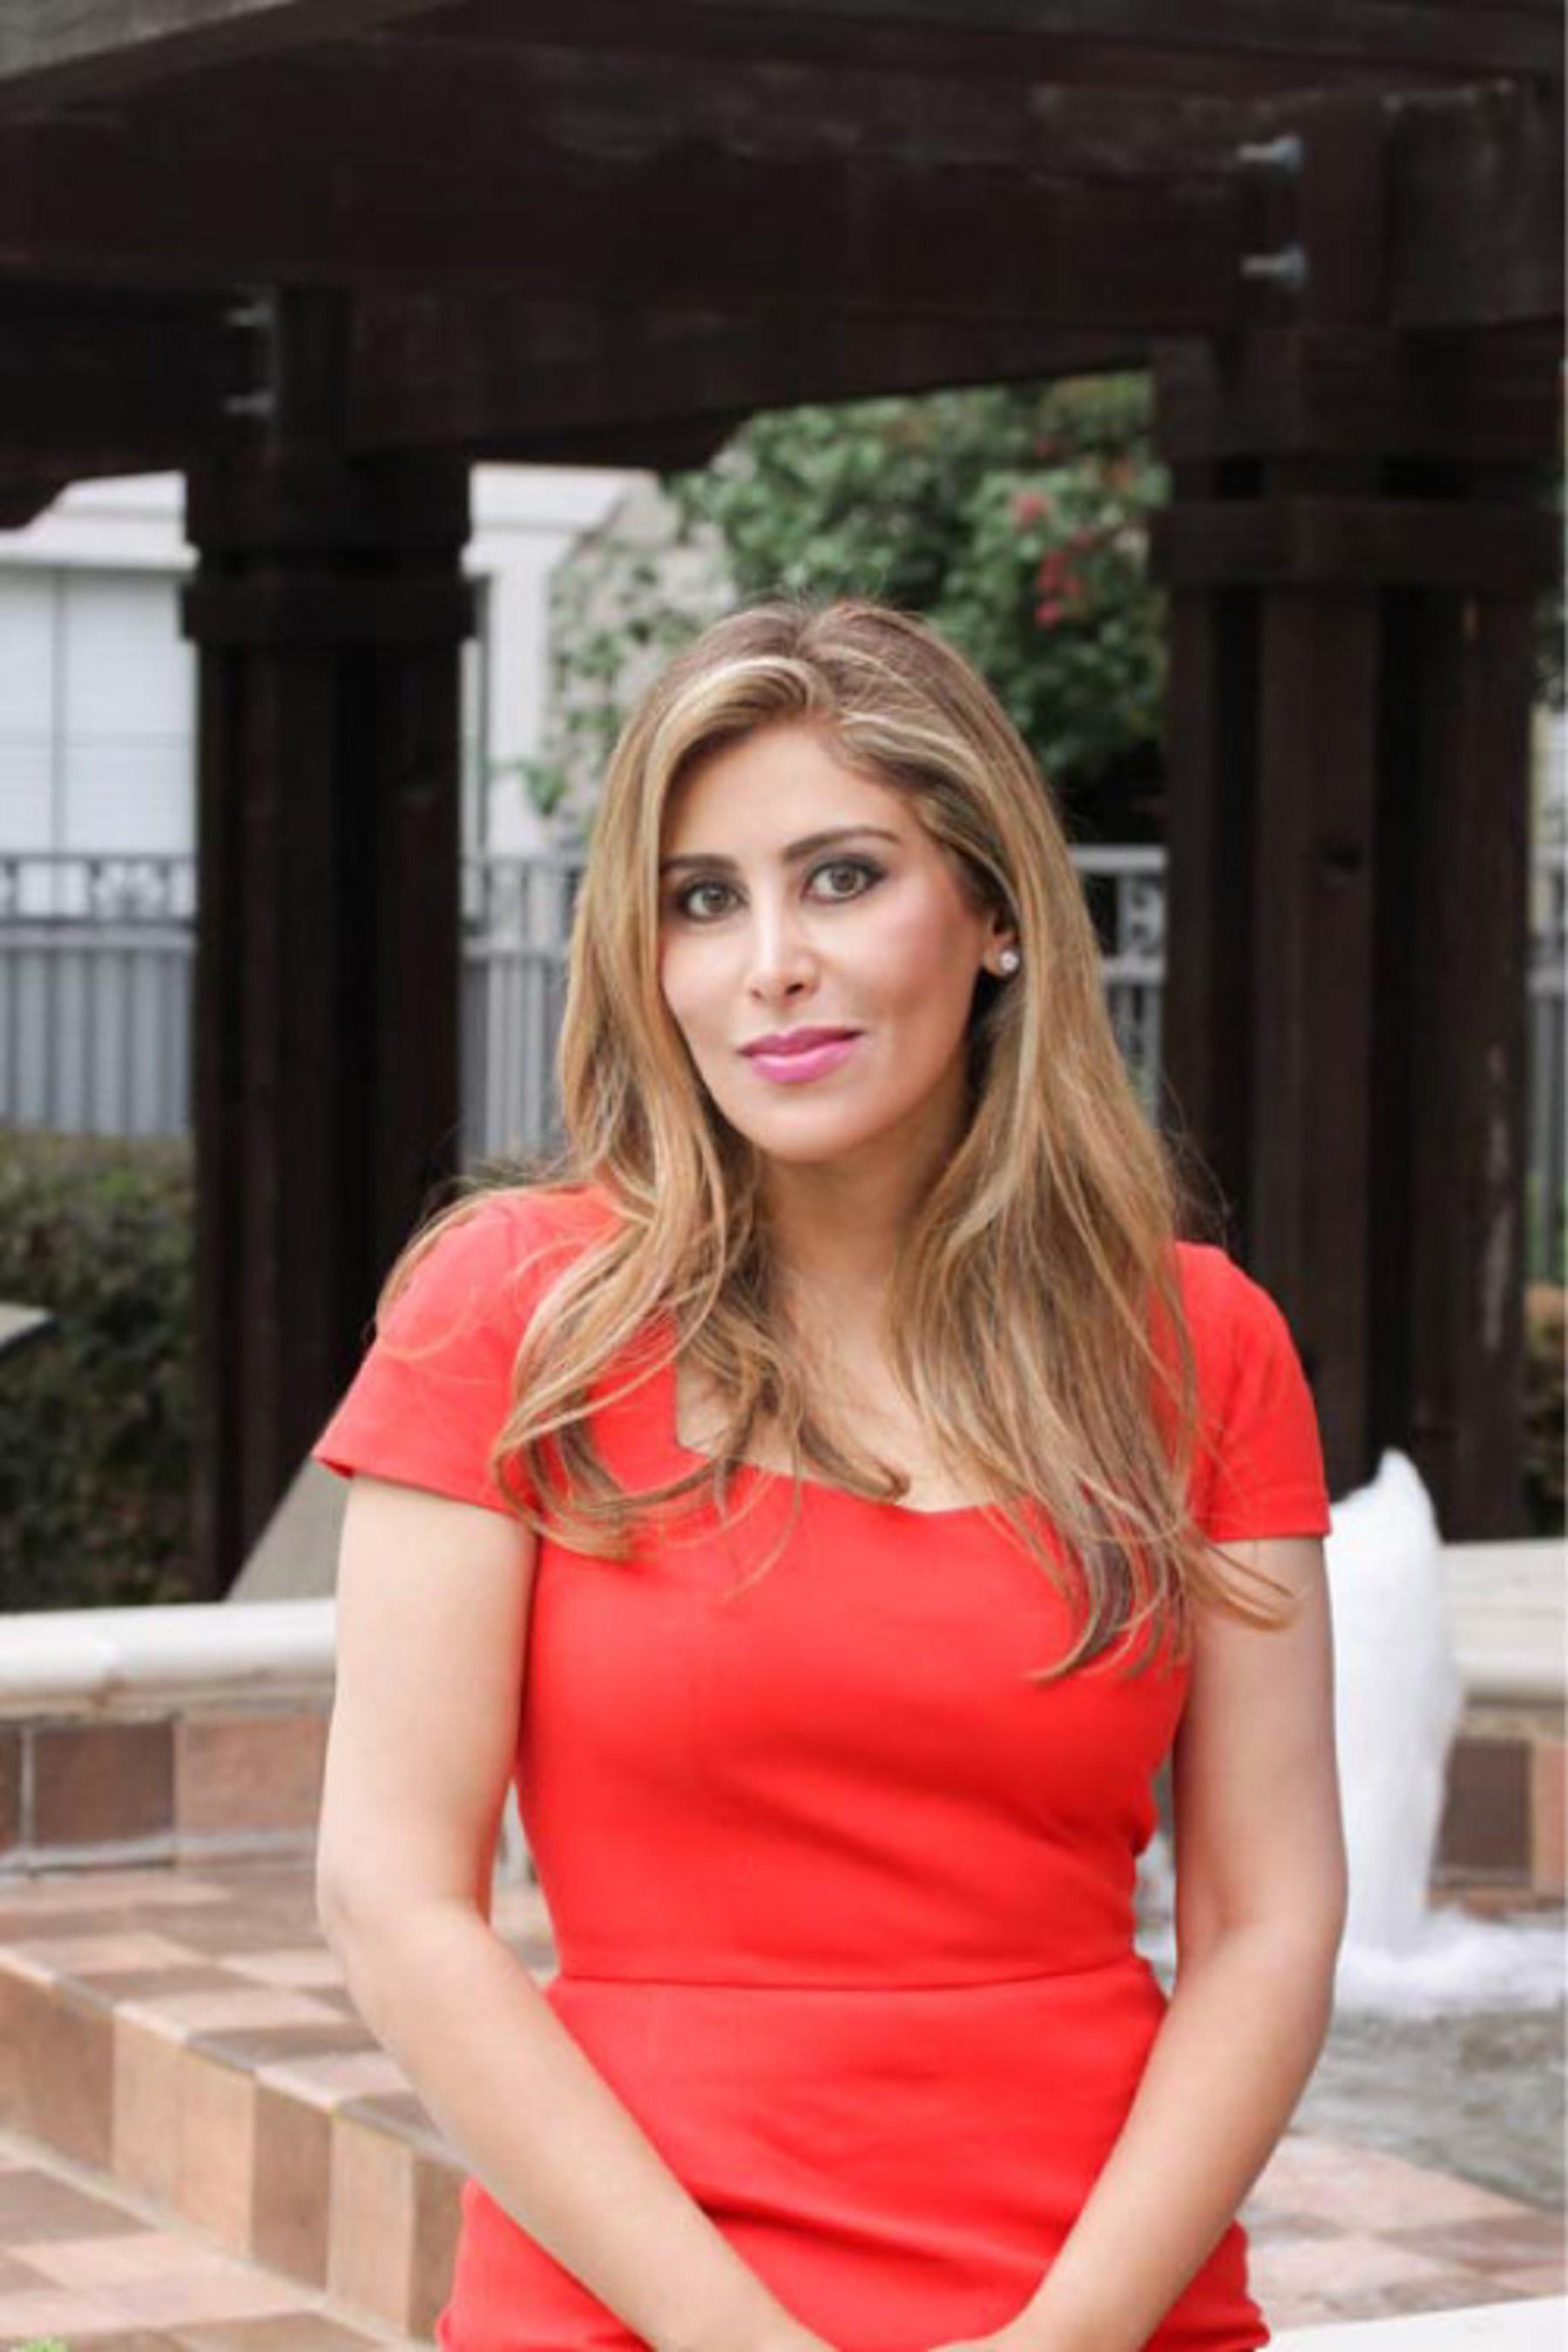 SKINTASTIC Announces New Dermatology Division, Elizabeth Houshmand M.D. as Director